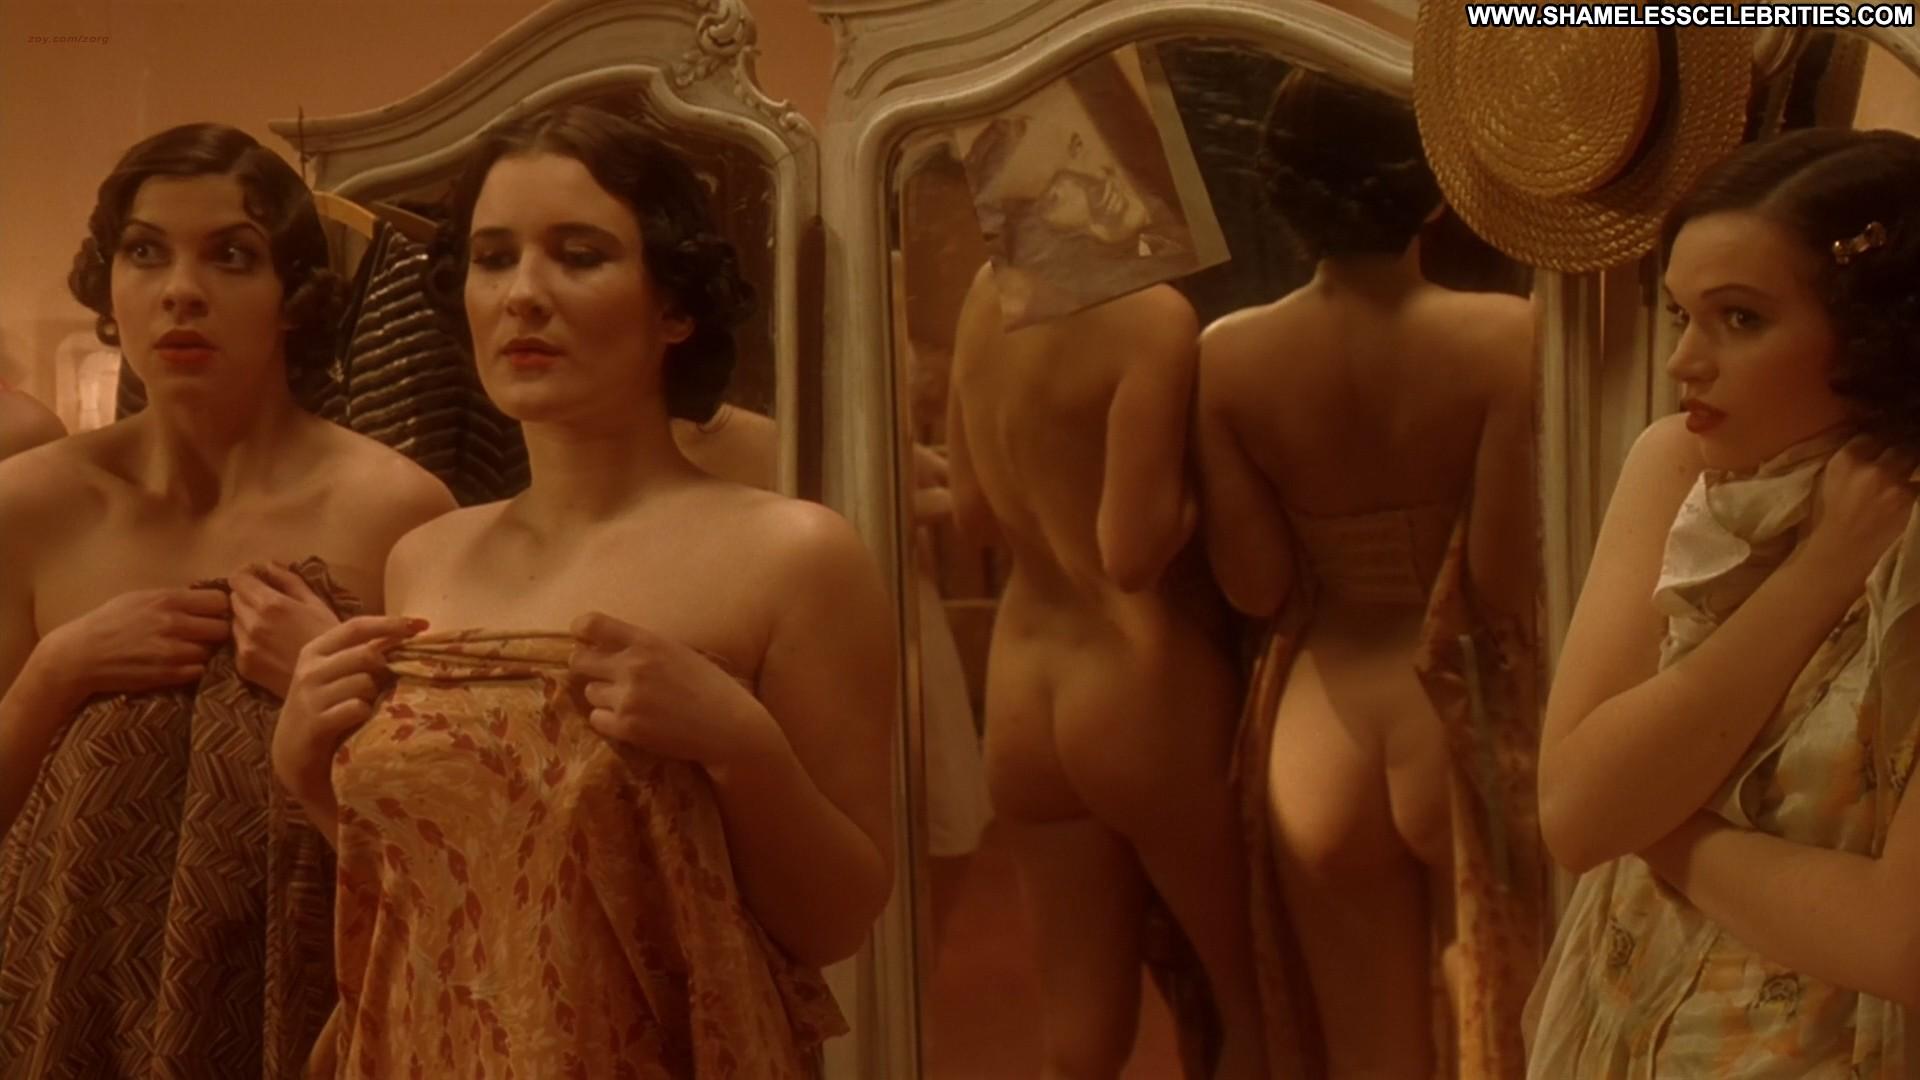 Mrs nevada nude pics very valuable